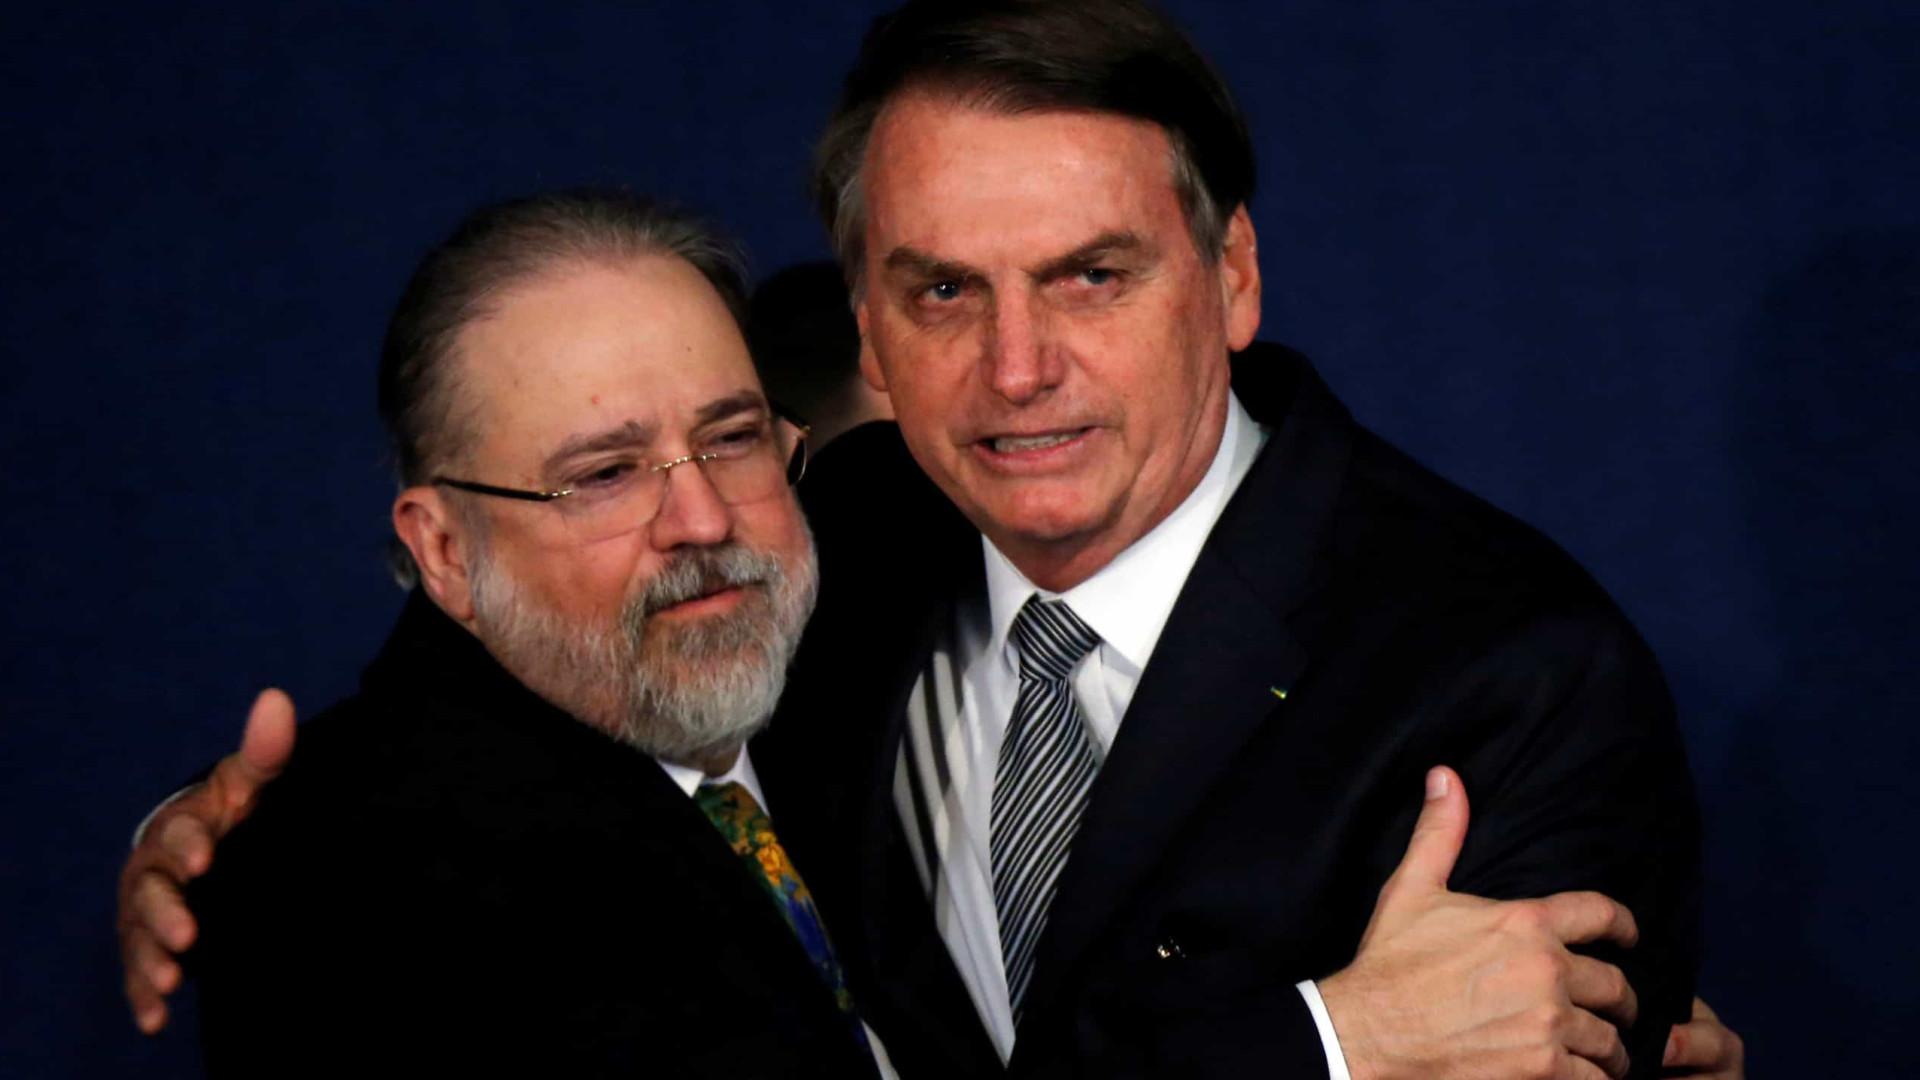 Bolsonaro pode decidir sobre isolamento, afirma Augusto Aras